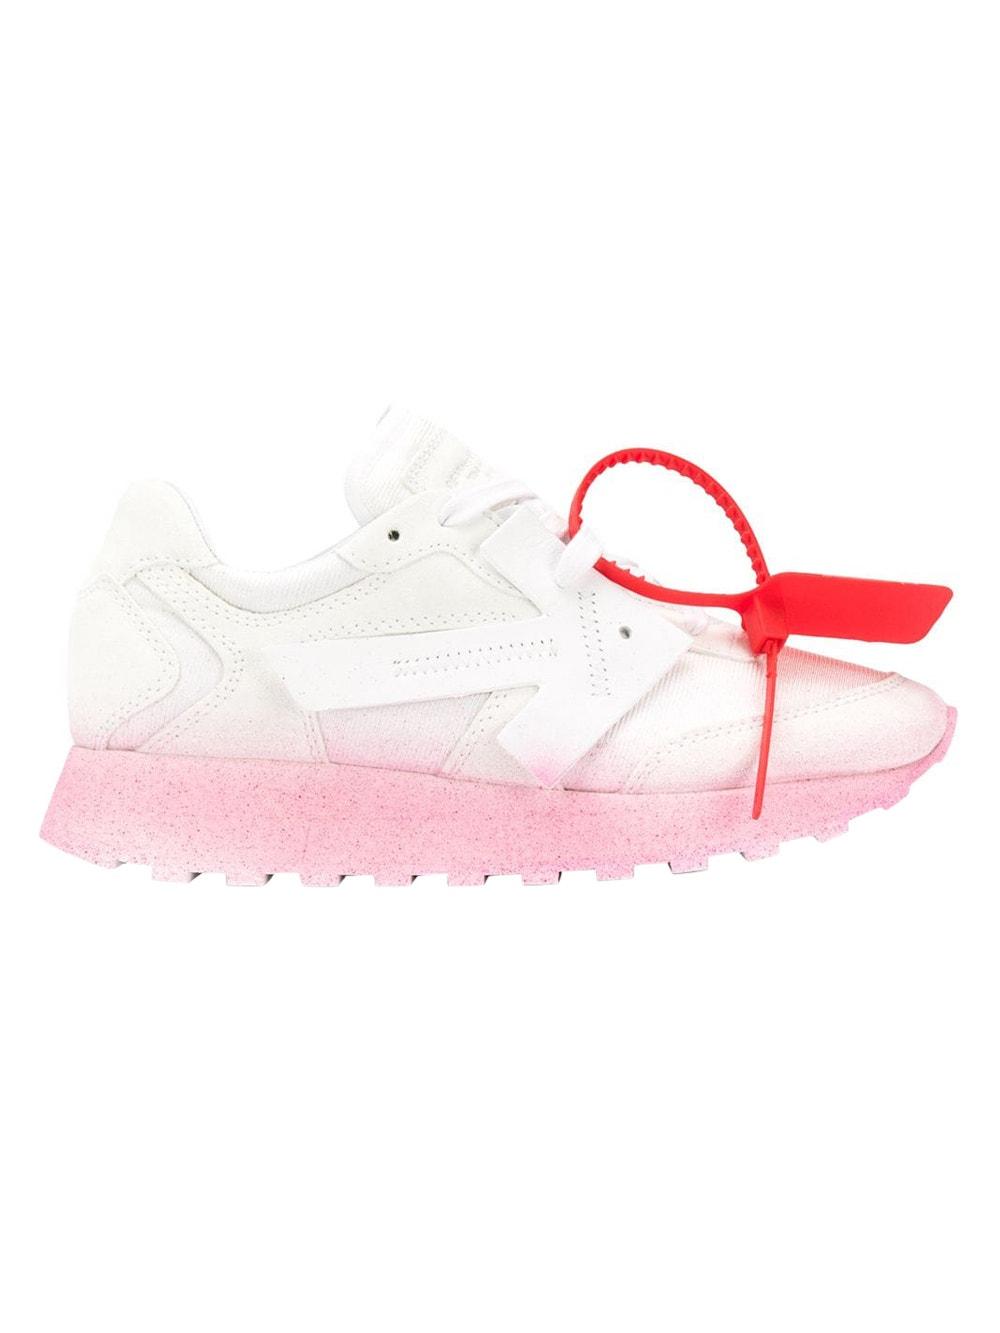 Off-White Sneakers PINK DEGRADE HG RUNNER SNEAKERS